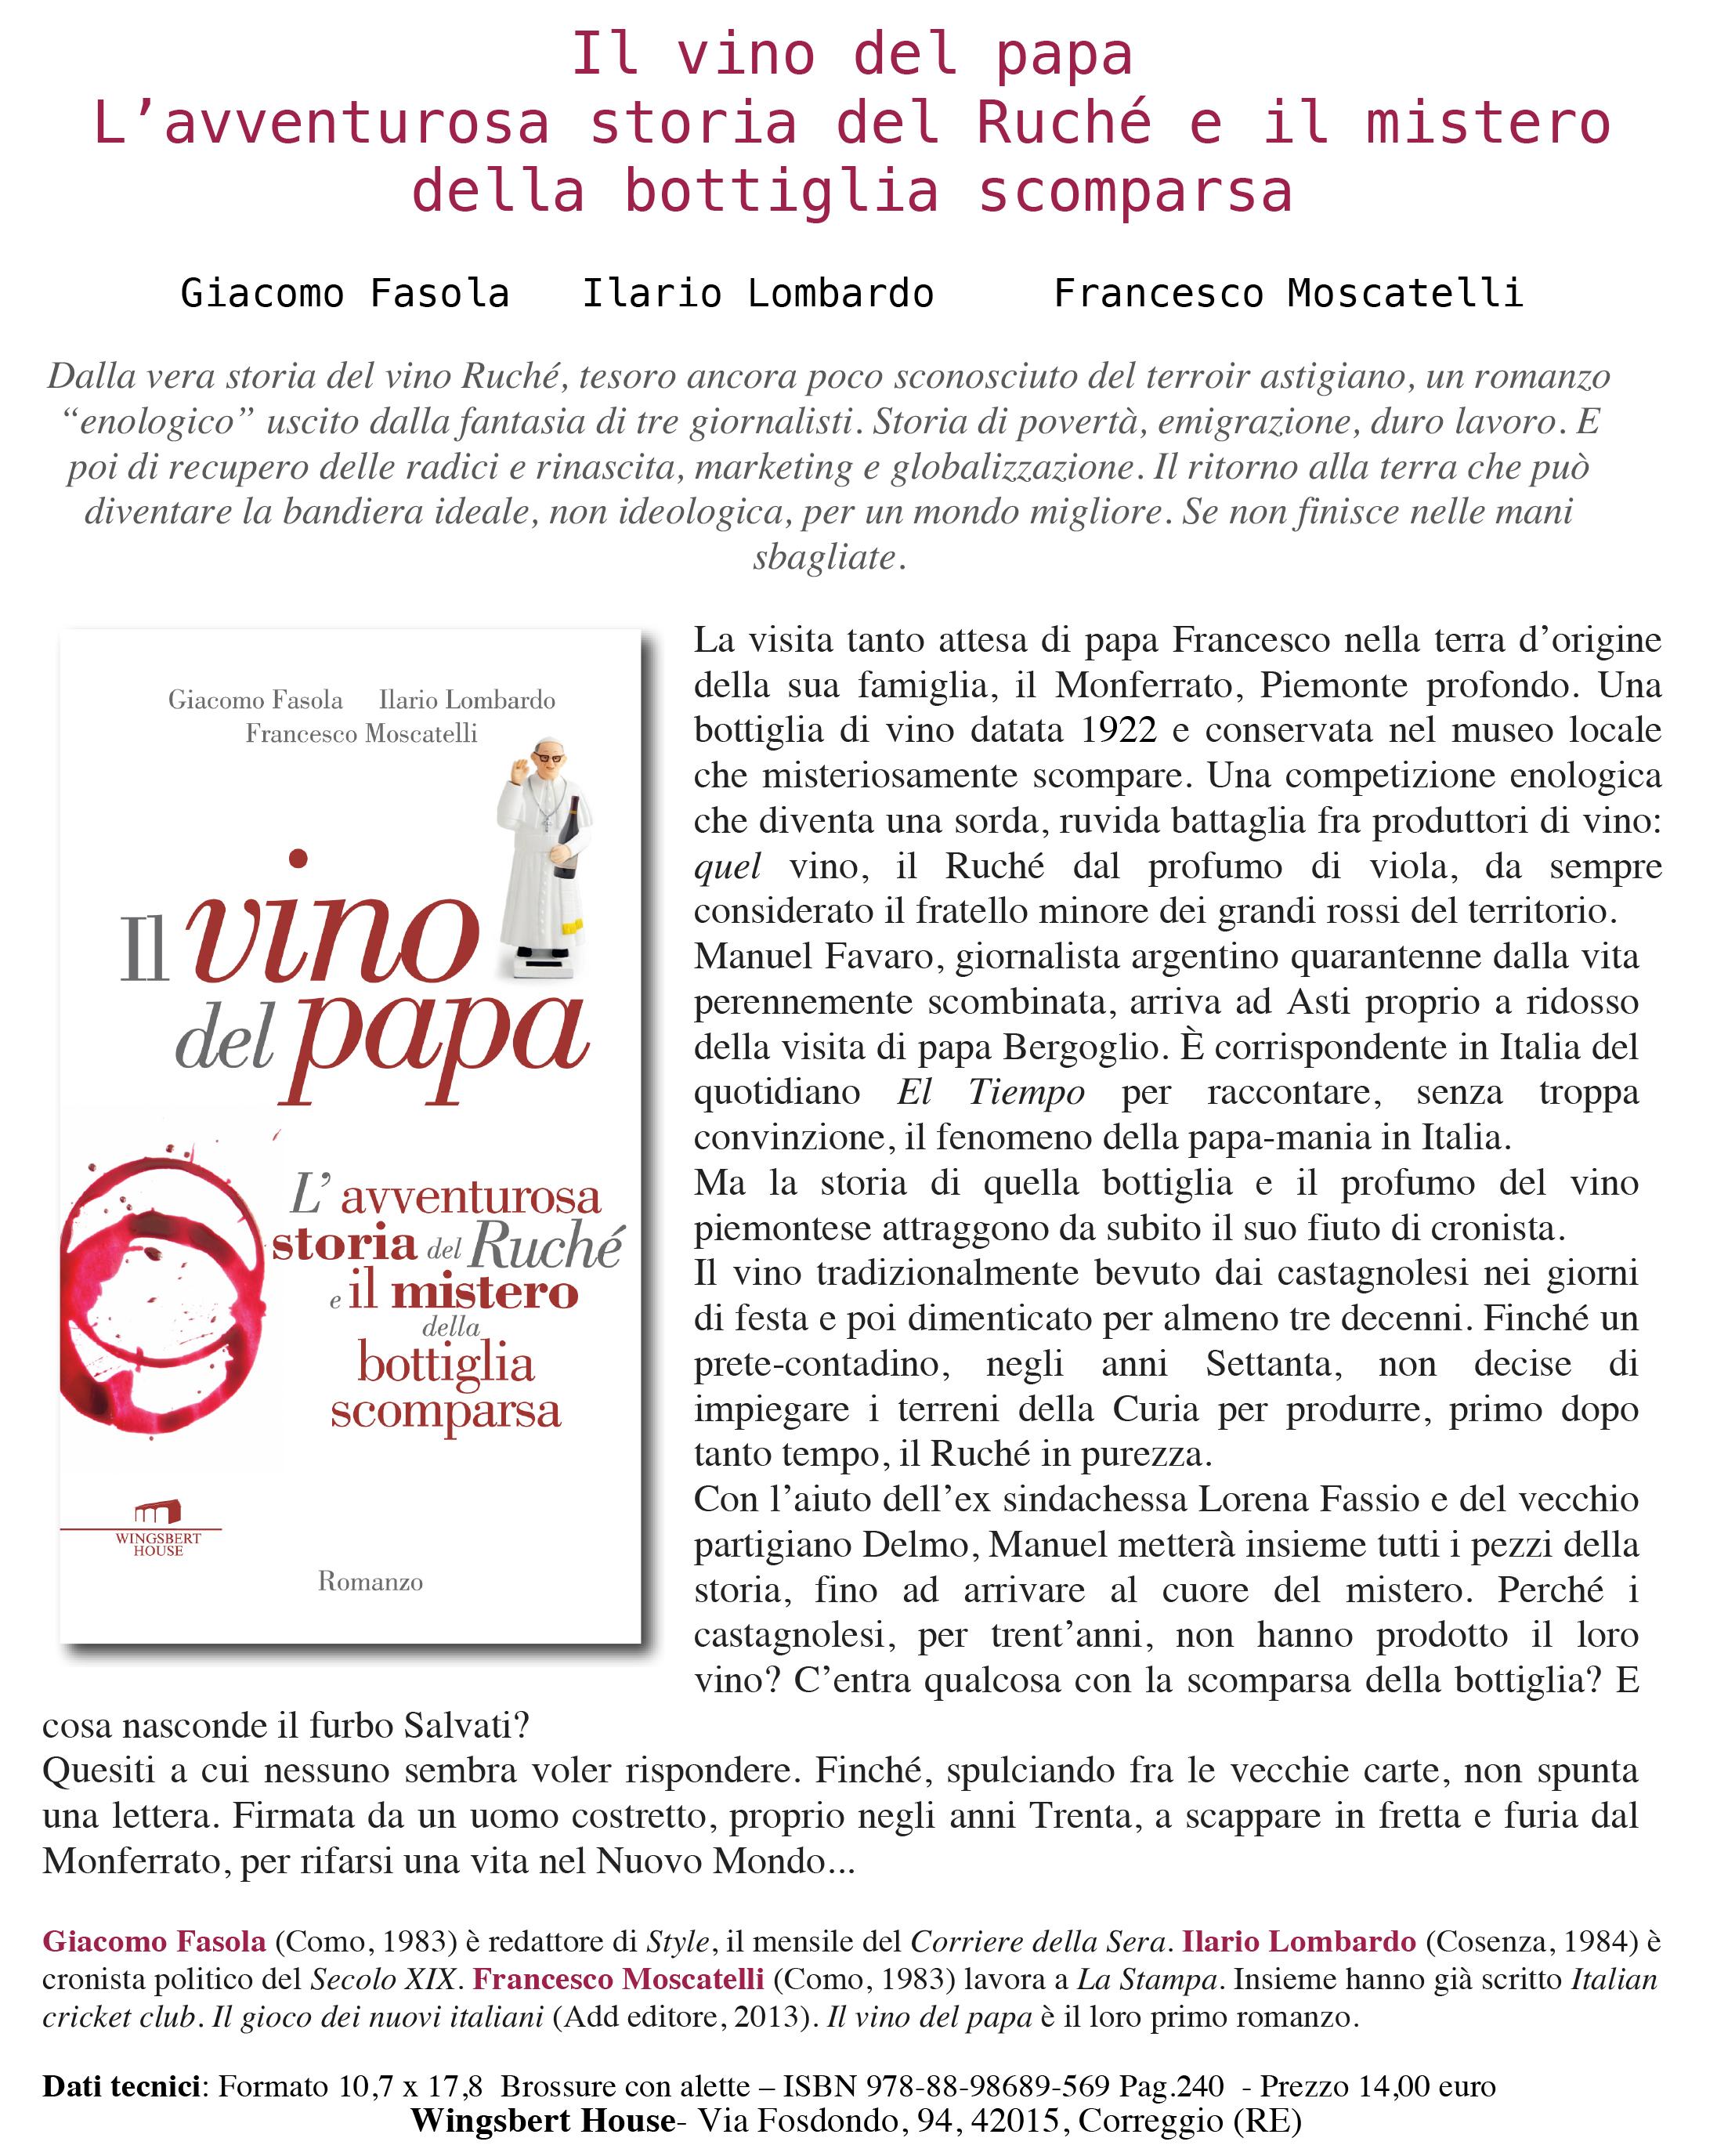 Microsoft Word - Scheda stampa Ruché word.doc